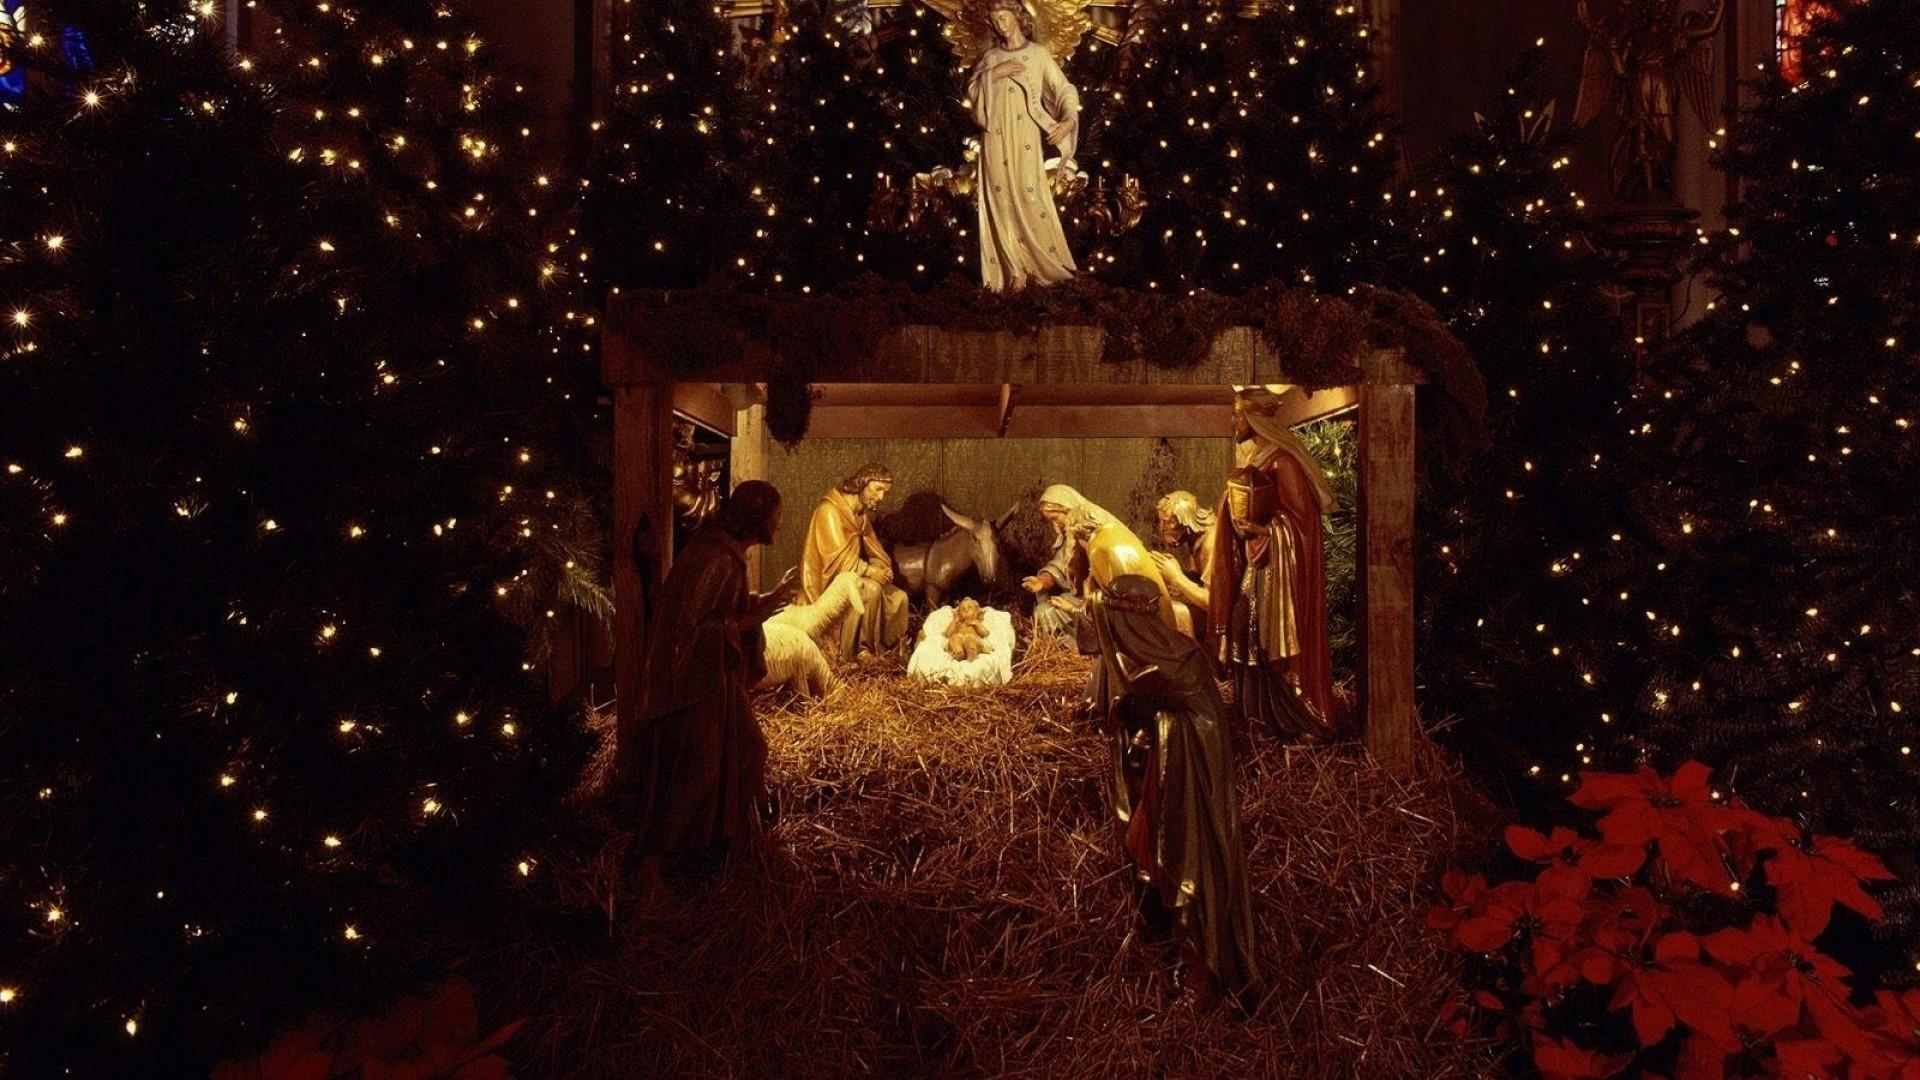 Preview wallpaper christmas, jesus, nurseries, christmas trees, garland,  holiday, people